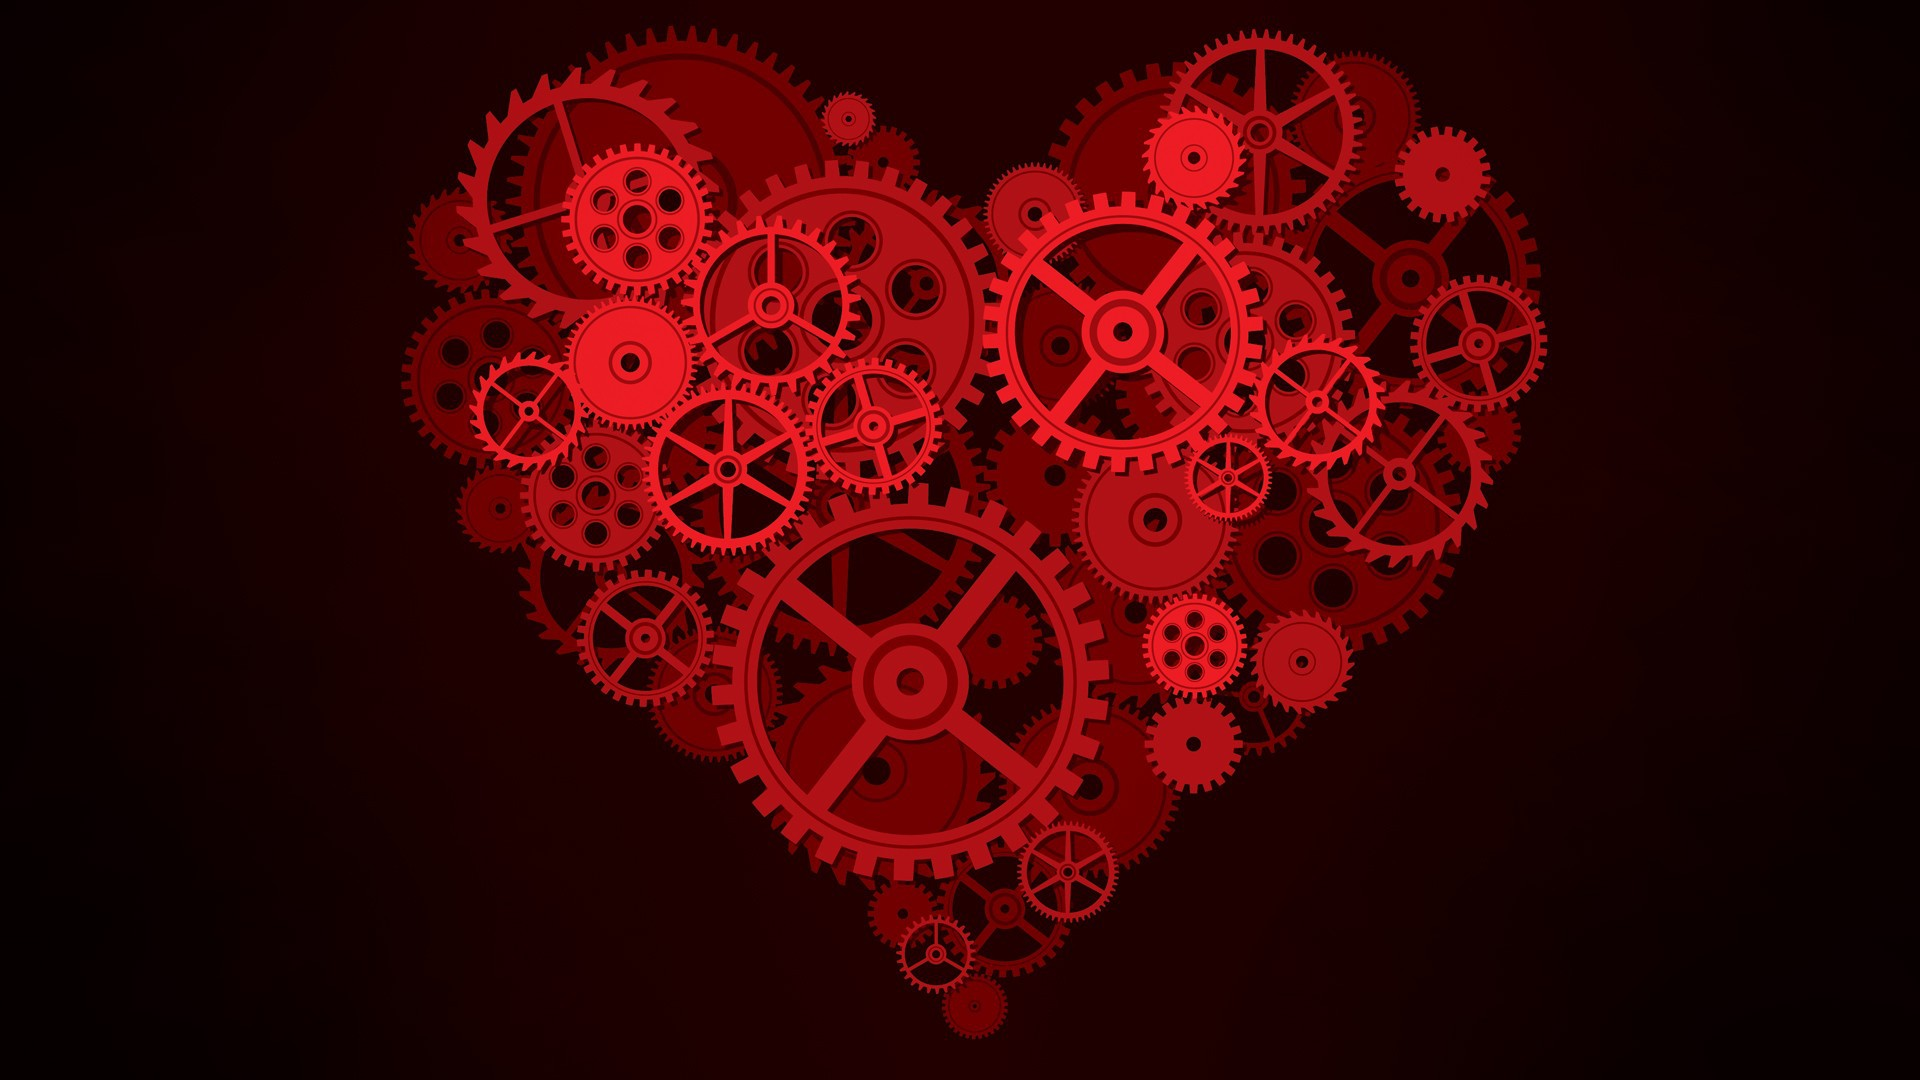 Quiero Tambien Un Corazon Holidays Saint Valentines Day Heart Of Gears